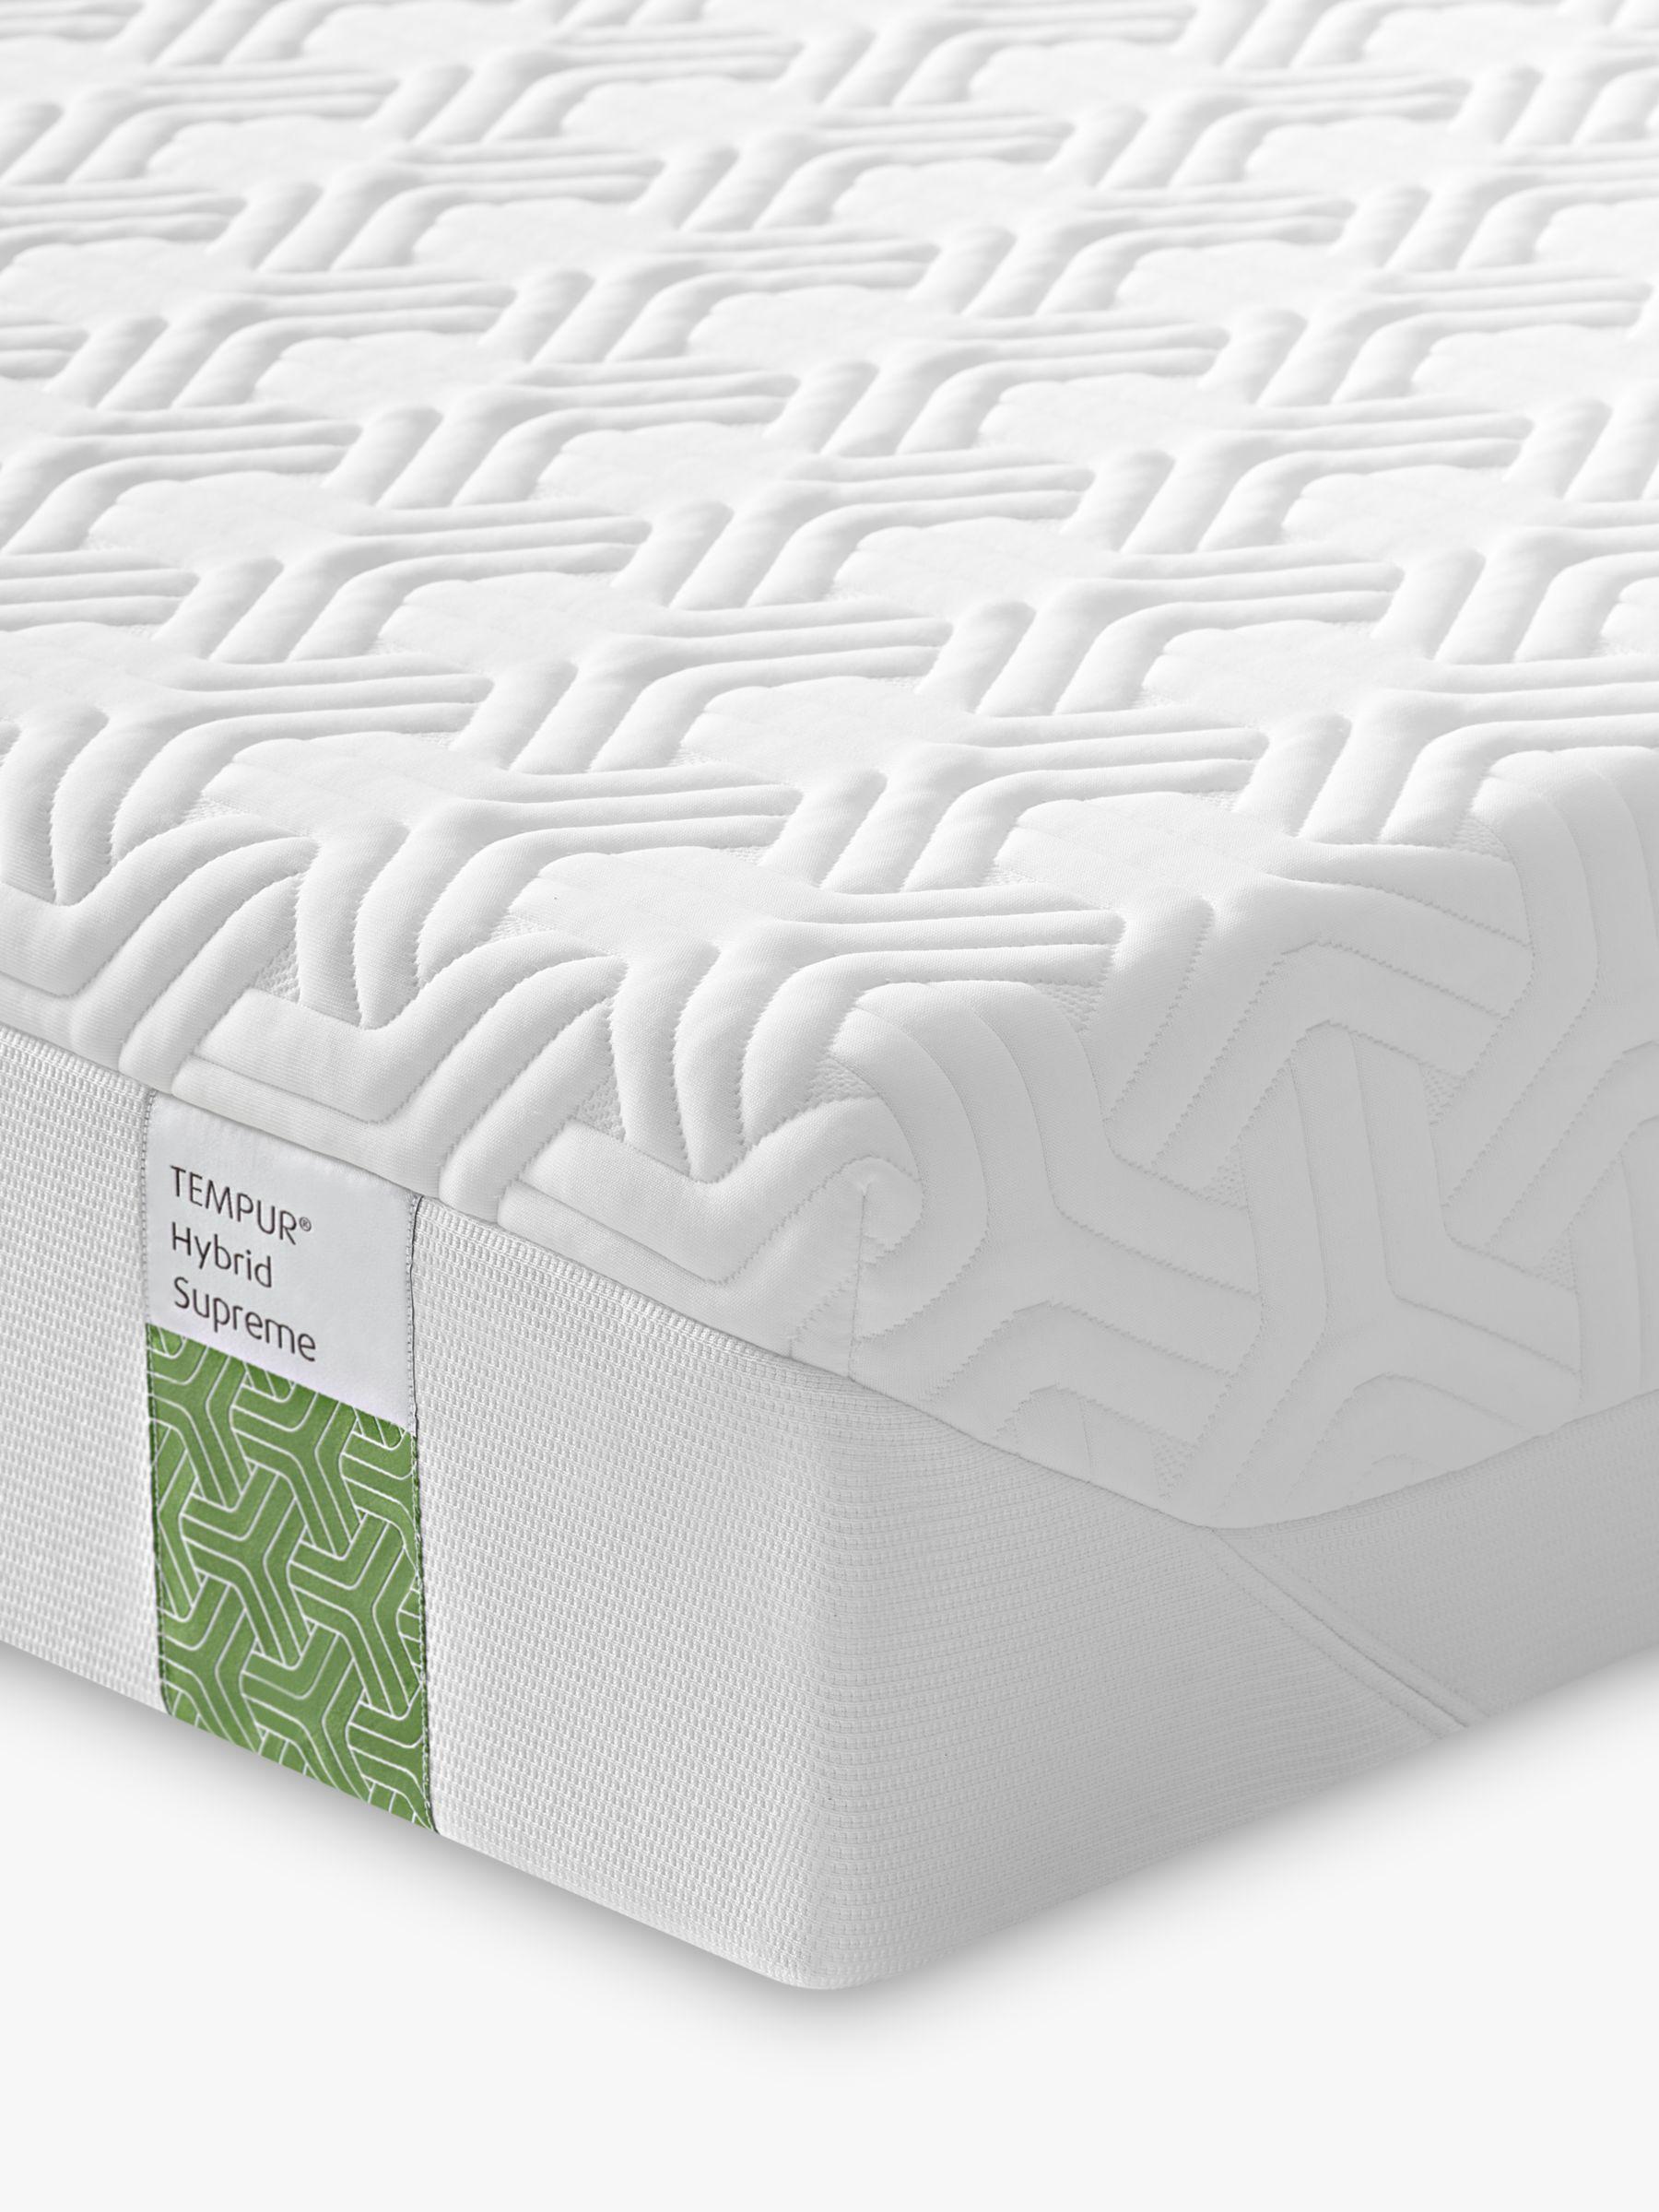 Tempur Tempur Hybrid Supreme Pocket Spring Memory Foam Mattress, King Size